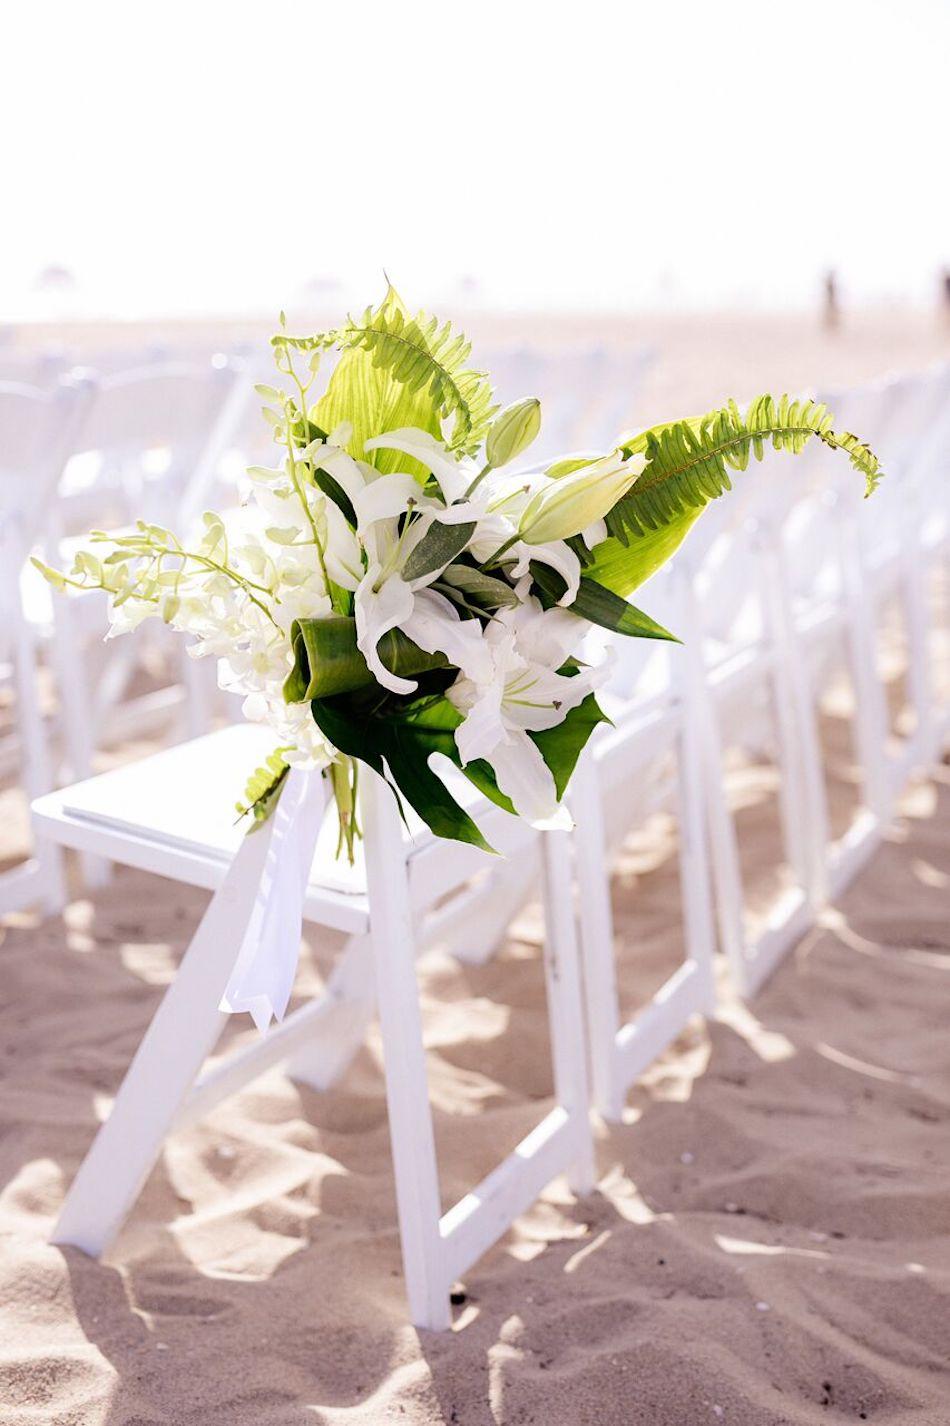 wedding flowers, beach wedding, wedding, flowers, navy, navy wedding, flowers by cina